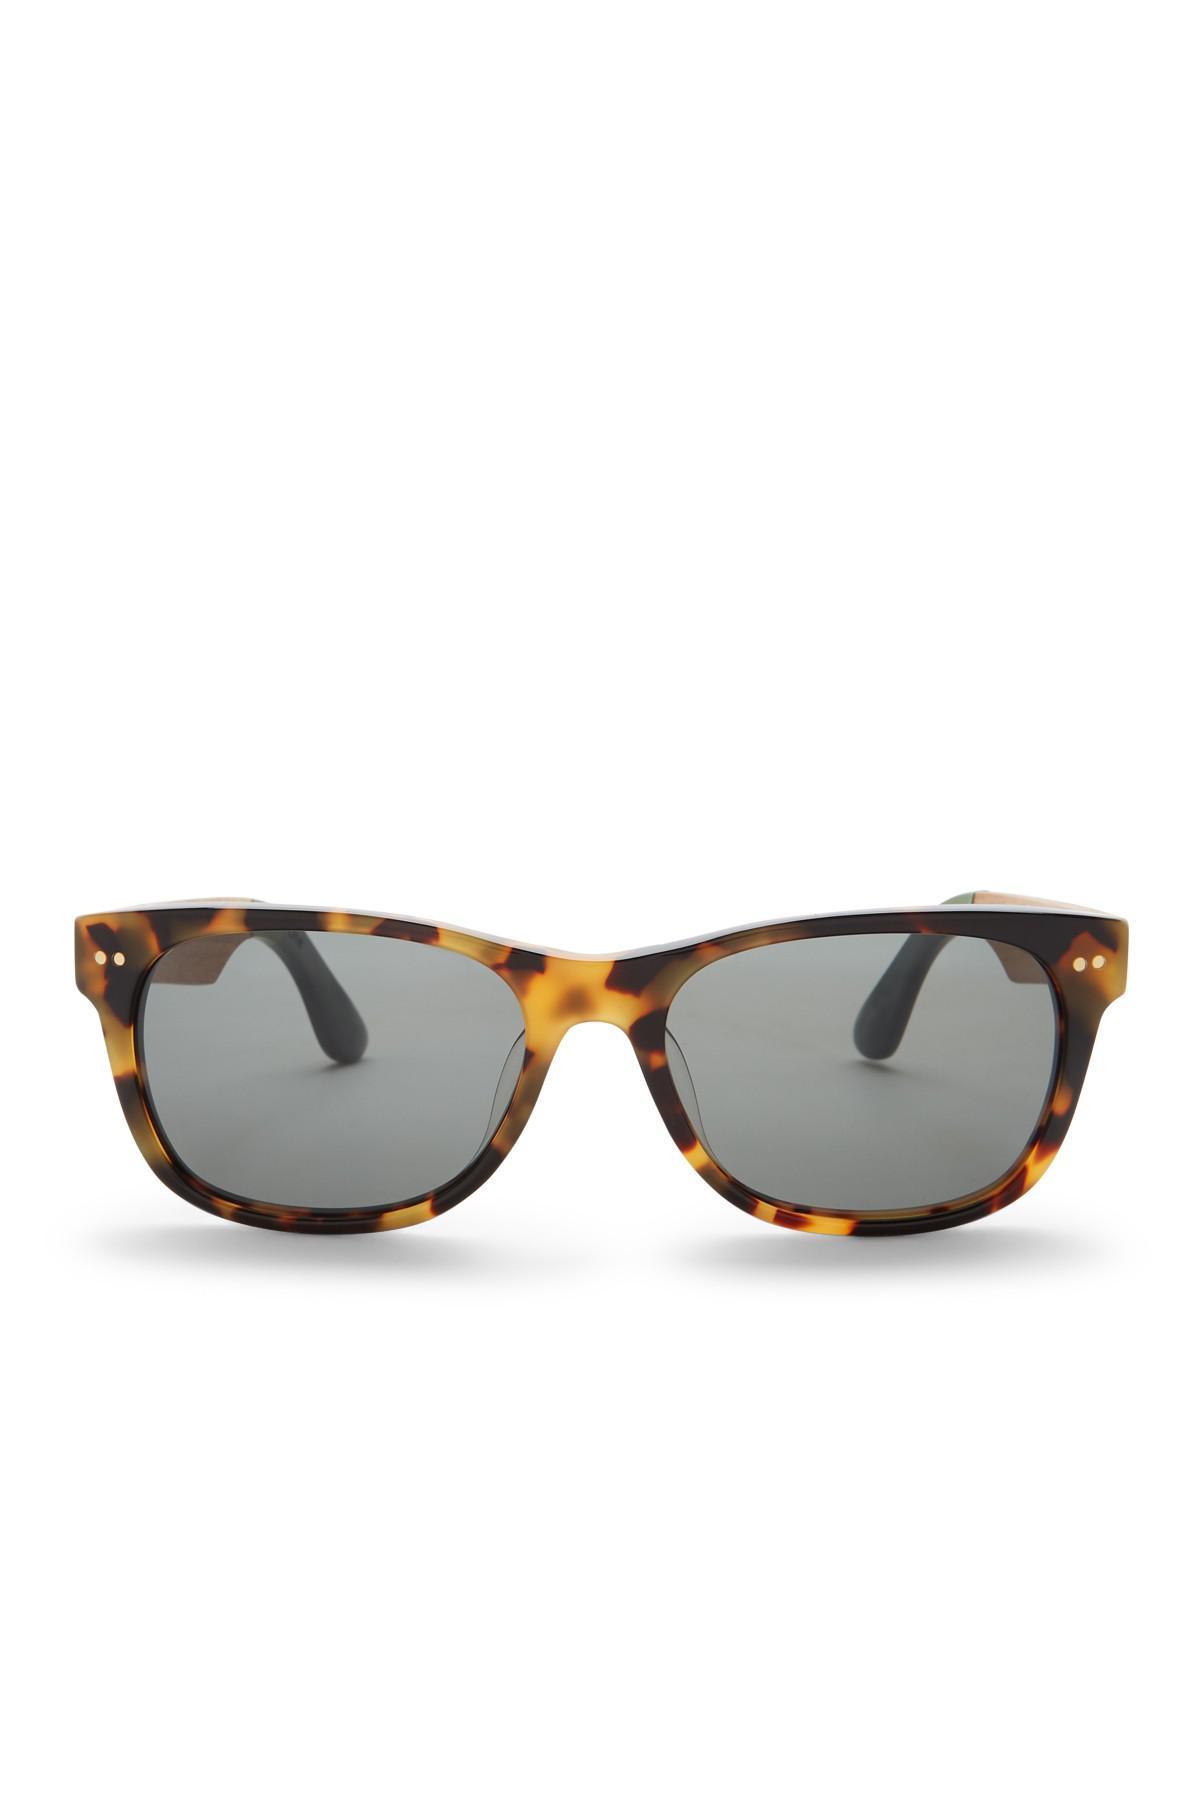 92521c3a2e9b Lyst - Toms Women s Beachmaster Sunglasses